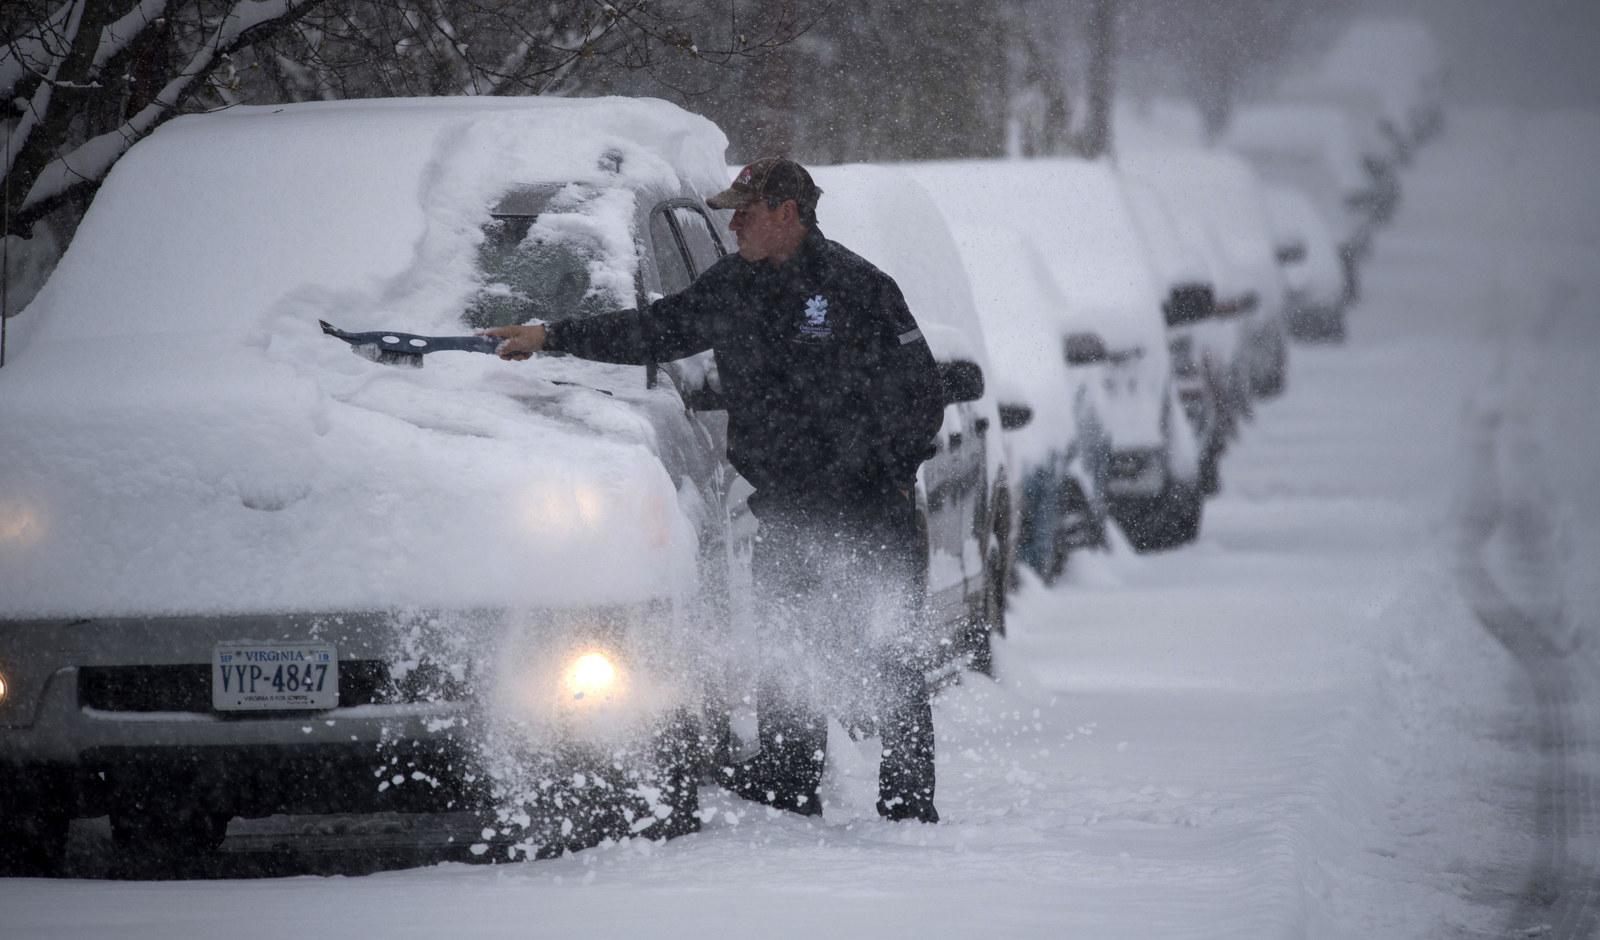 Snow, Sleet, And Ice Wreak Havoc As Winter Storm Diego Slams The Southeast